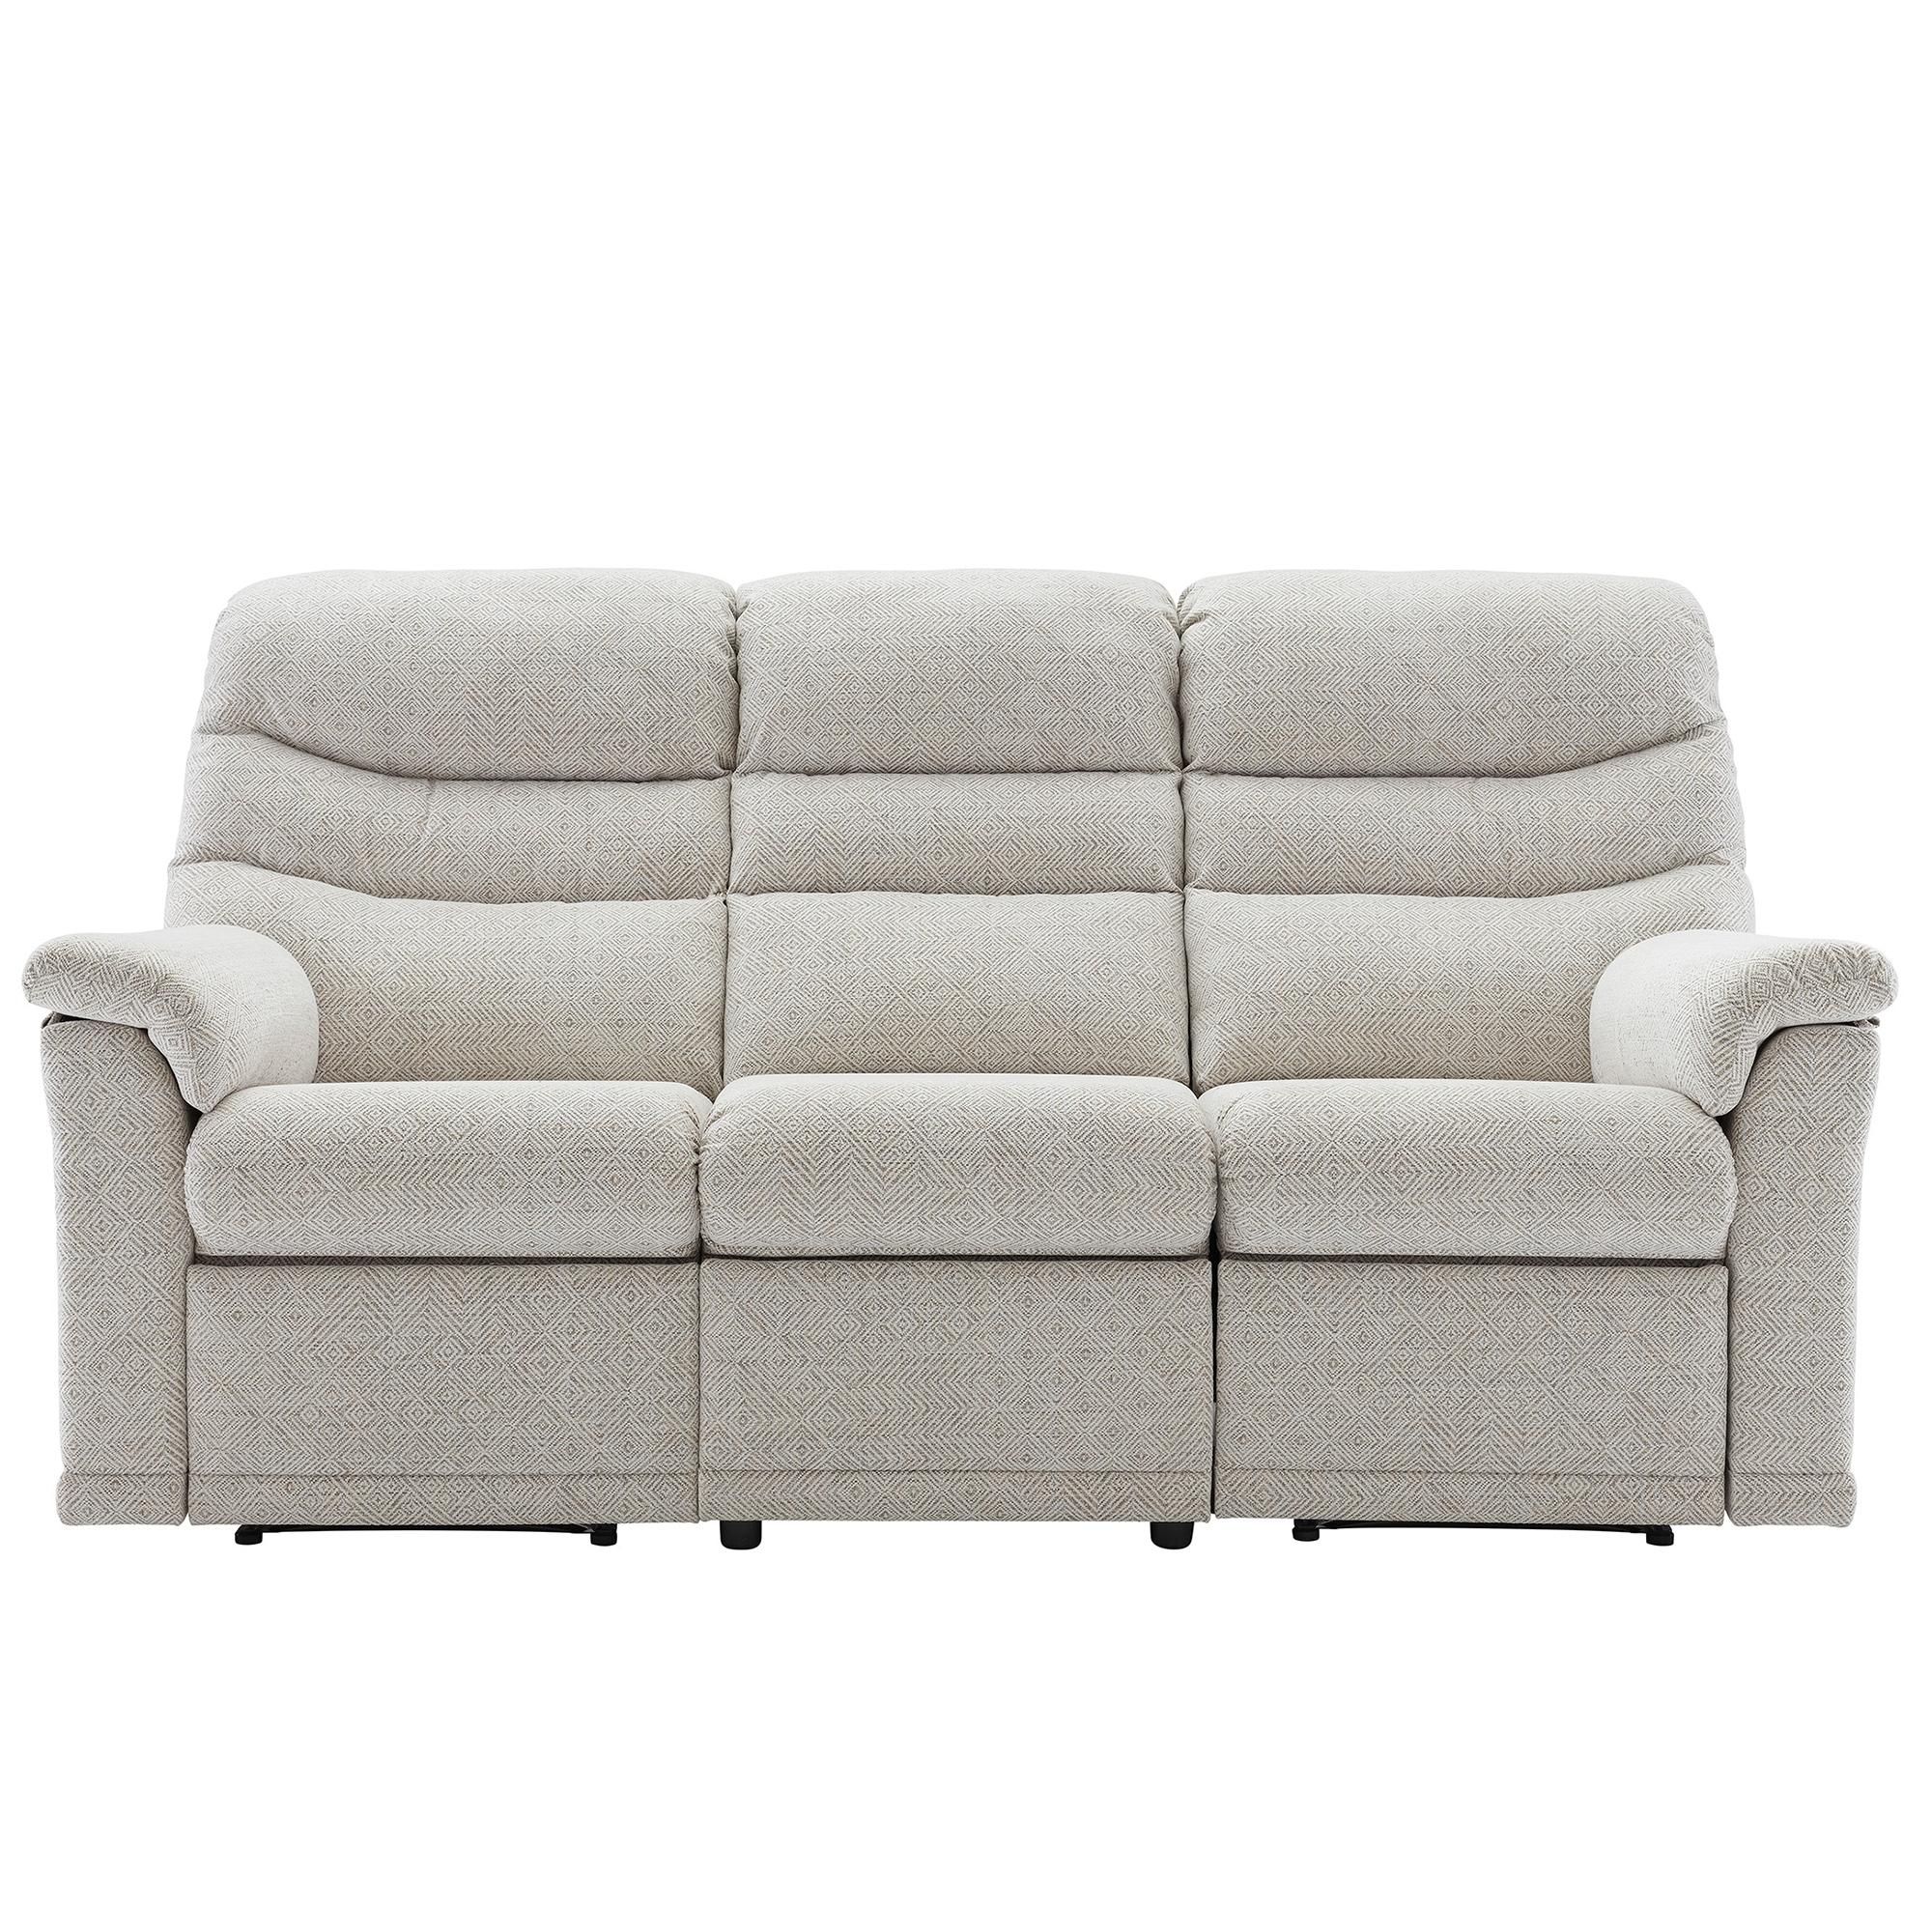 g plan malvern 3 seater double power recliner sofa